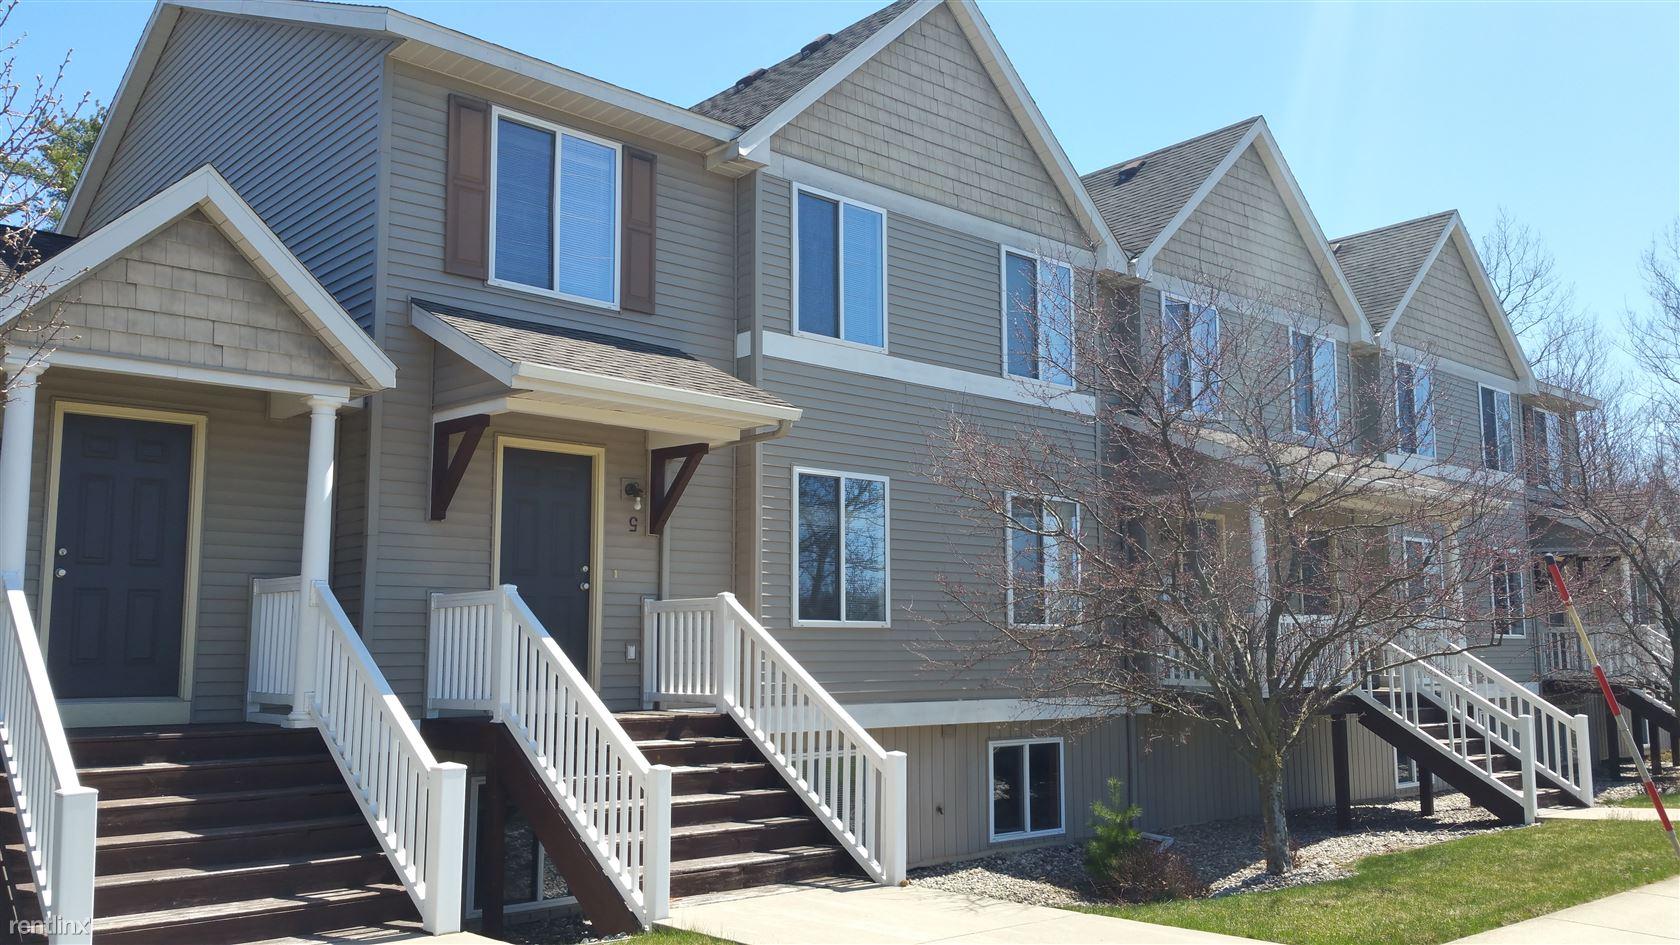 $1200 - $783 per month , 11334 48th Ave, Northridge Apartments